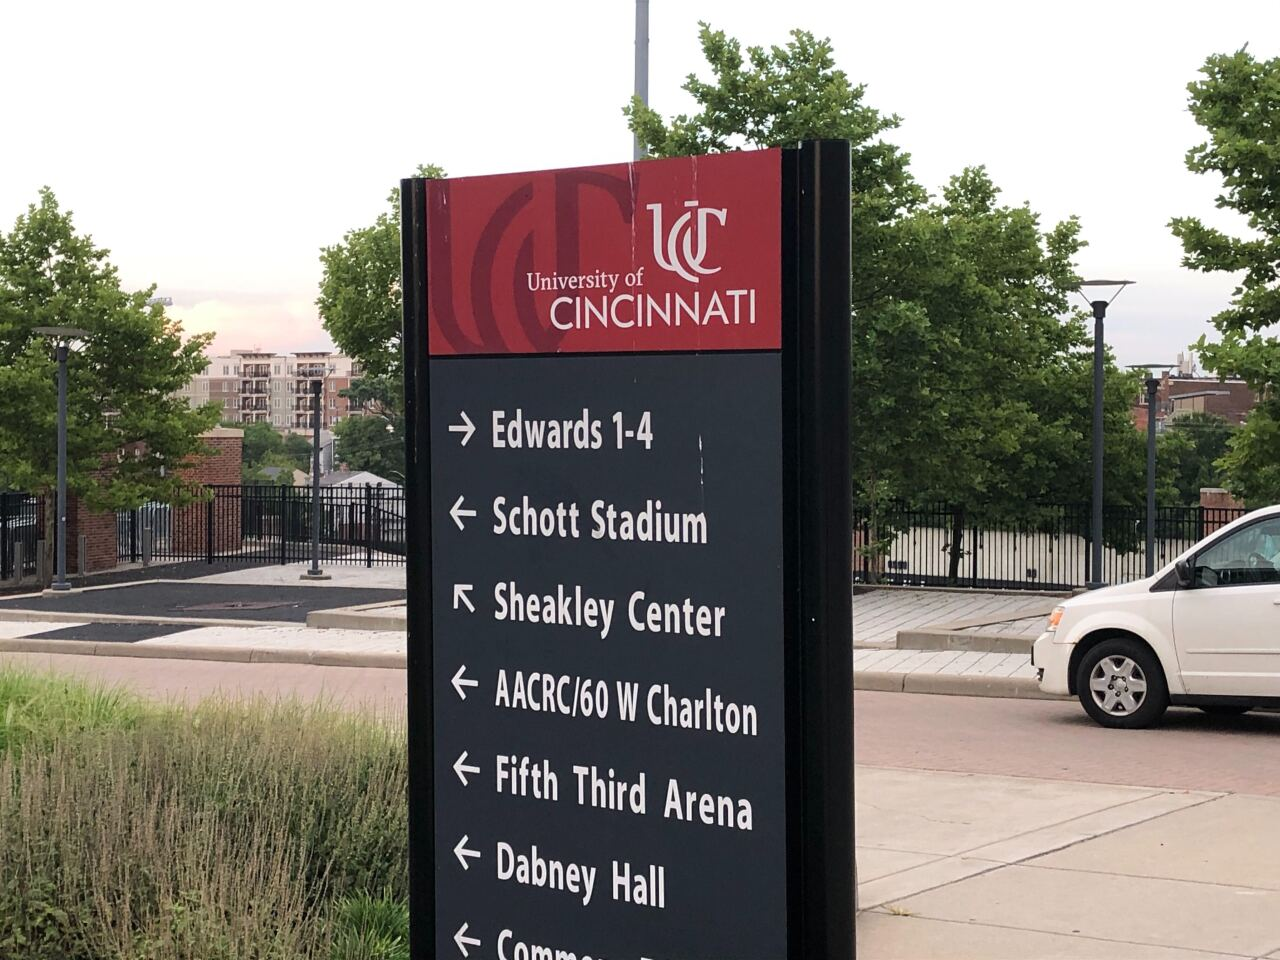 UC Campus signage Marge Schott